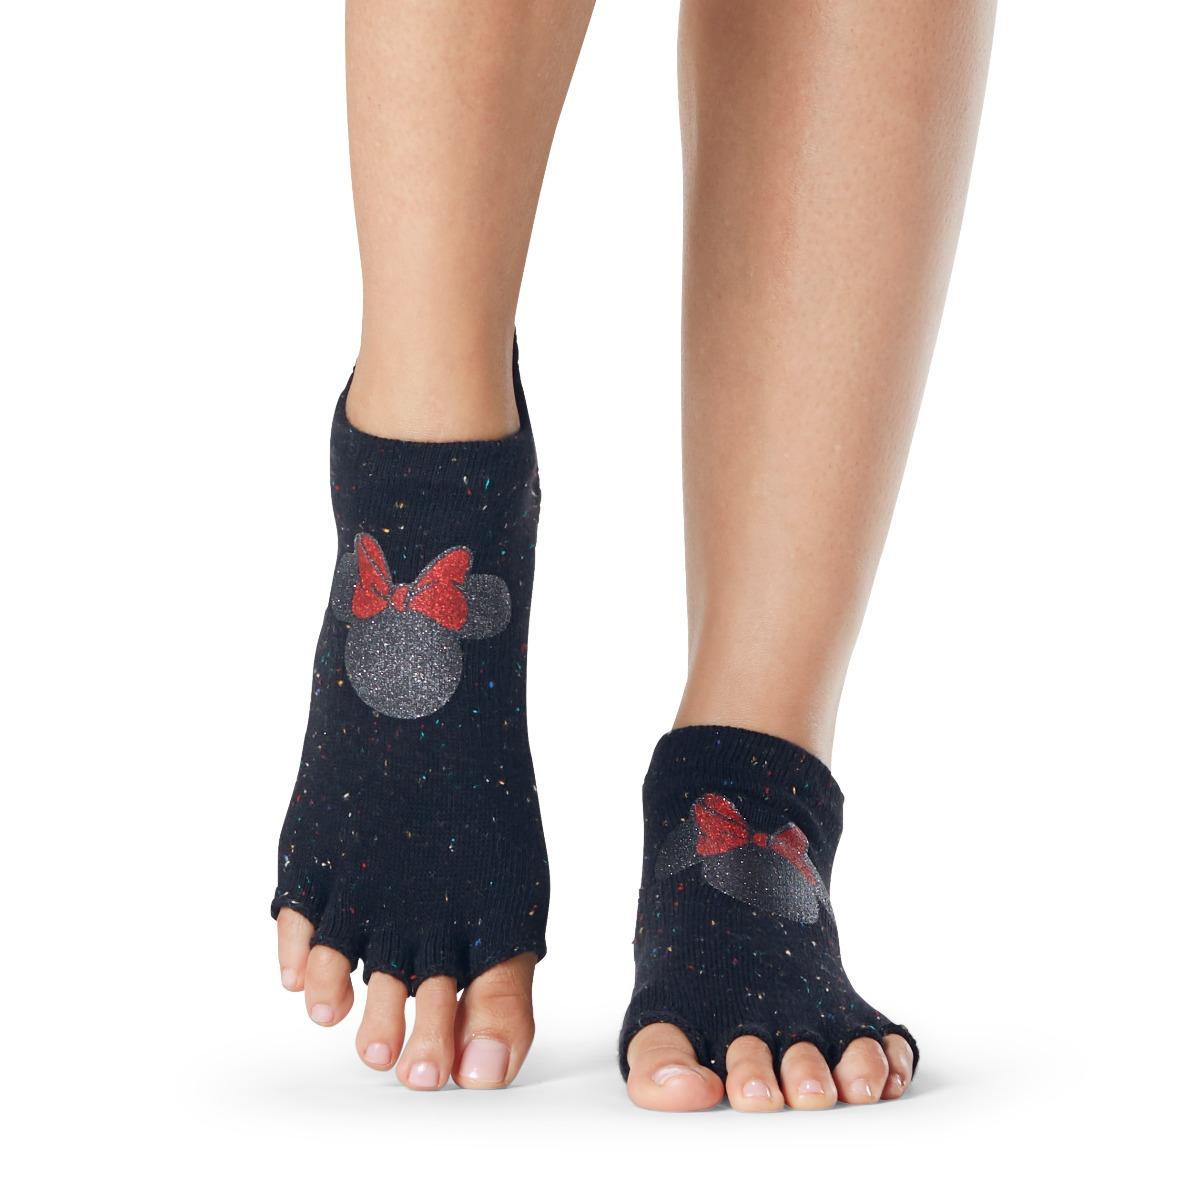 Yogasocken ToeSox Low Rise Half Toe Confetti Minnie - 1